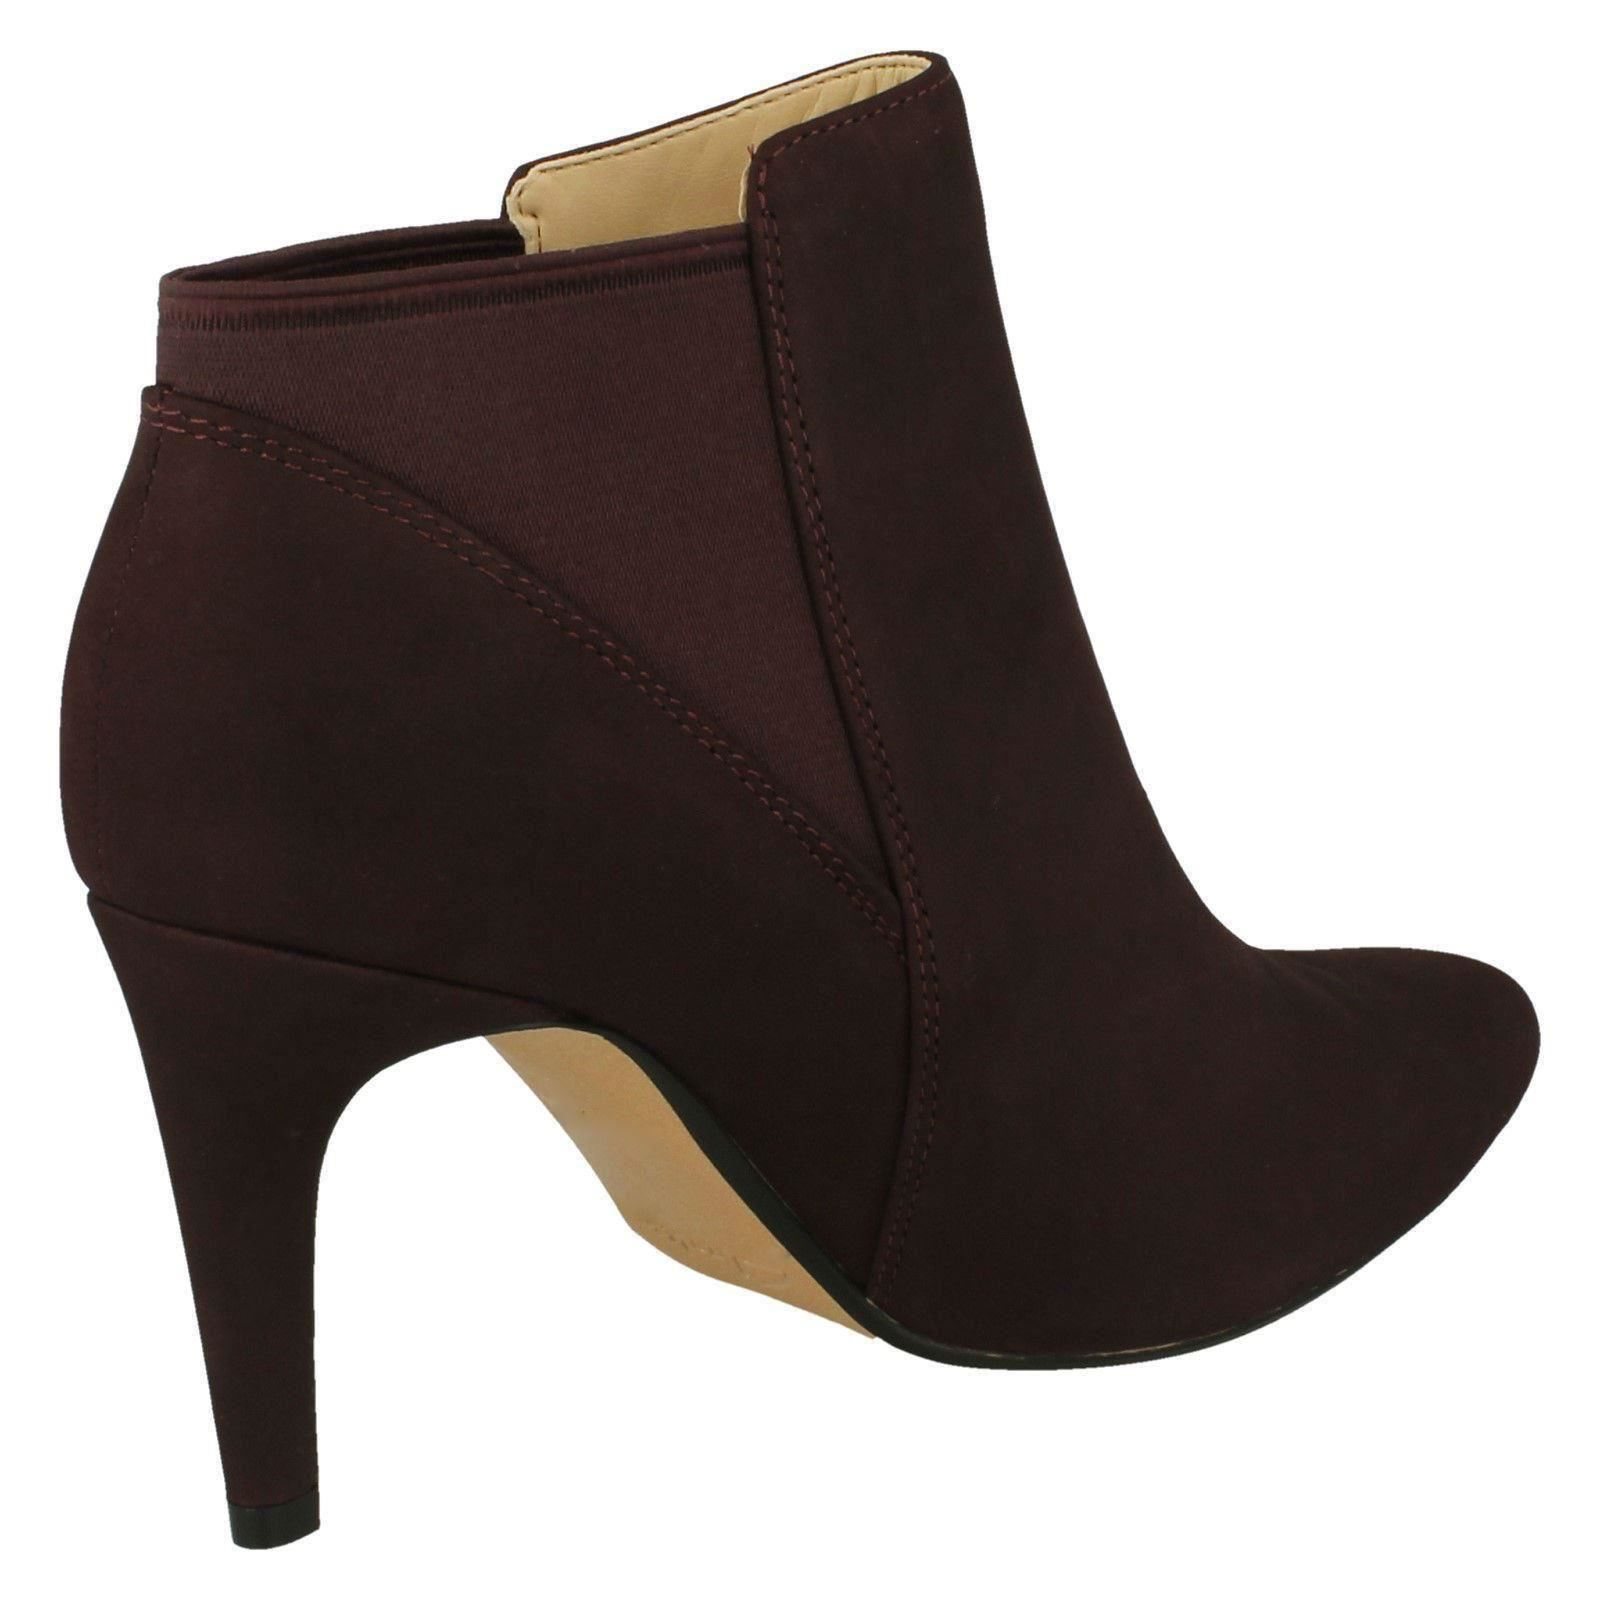 3c94e871 Mujer-Clarks-pull-Botines-Laina-Violeta miniatura 6